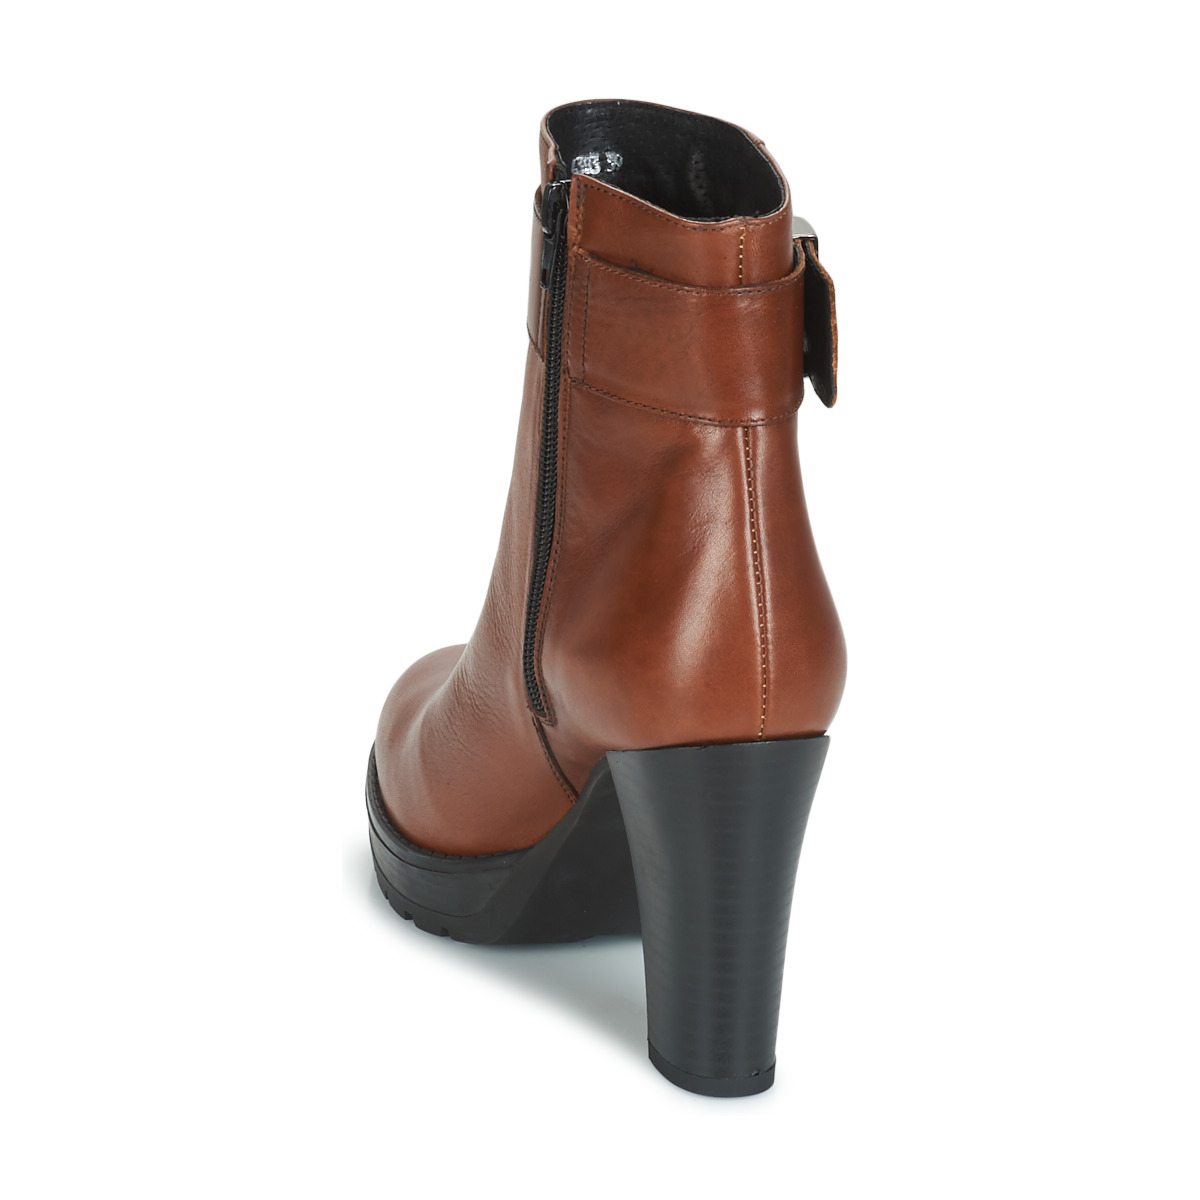 Betty London Jarambole Marron - Livraison Gratuite Chaussures Bottine Femme 79,99 €